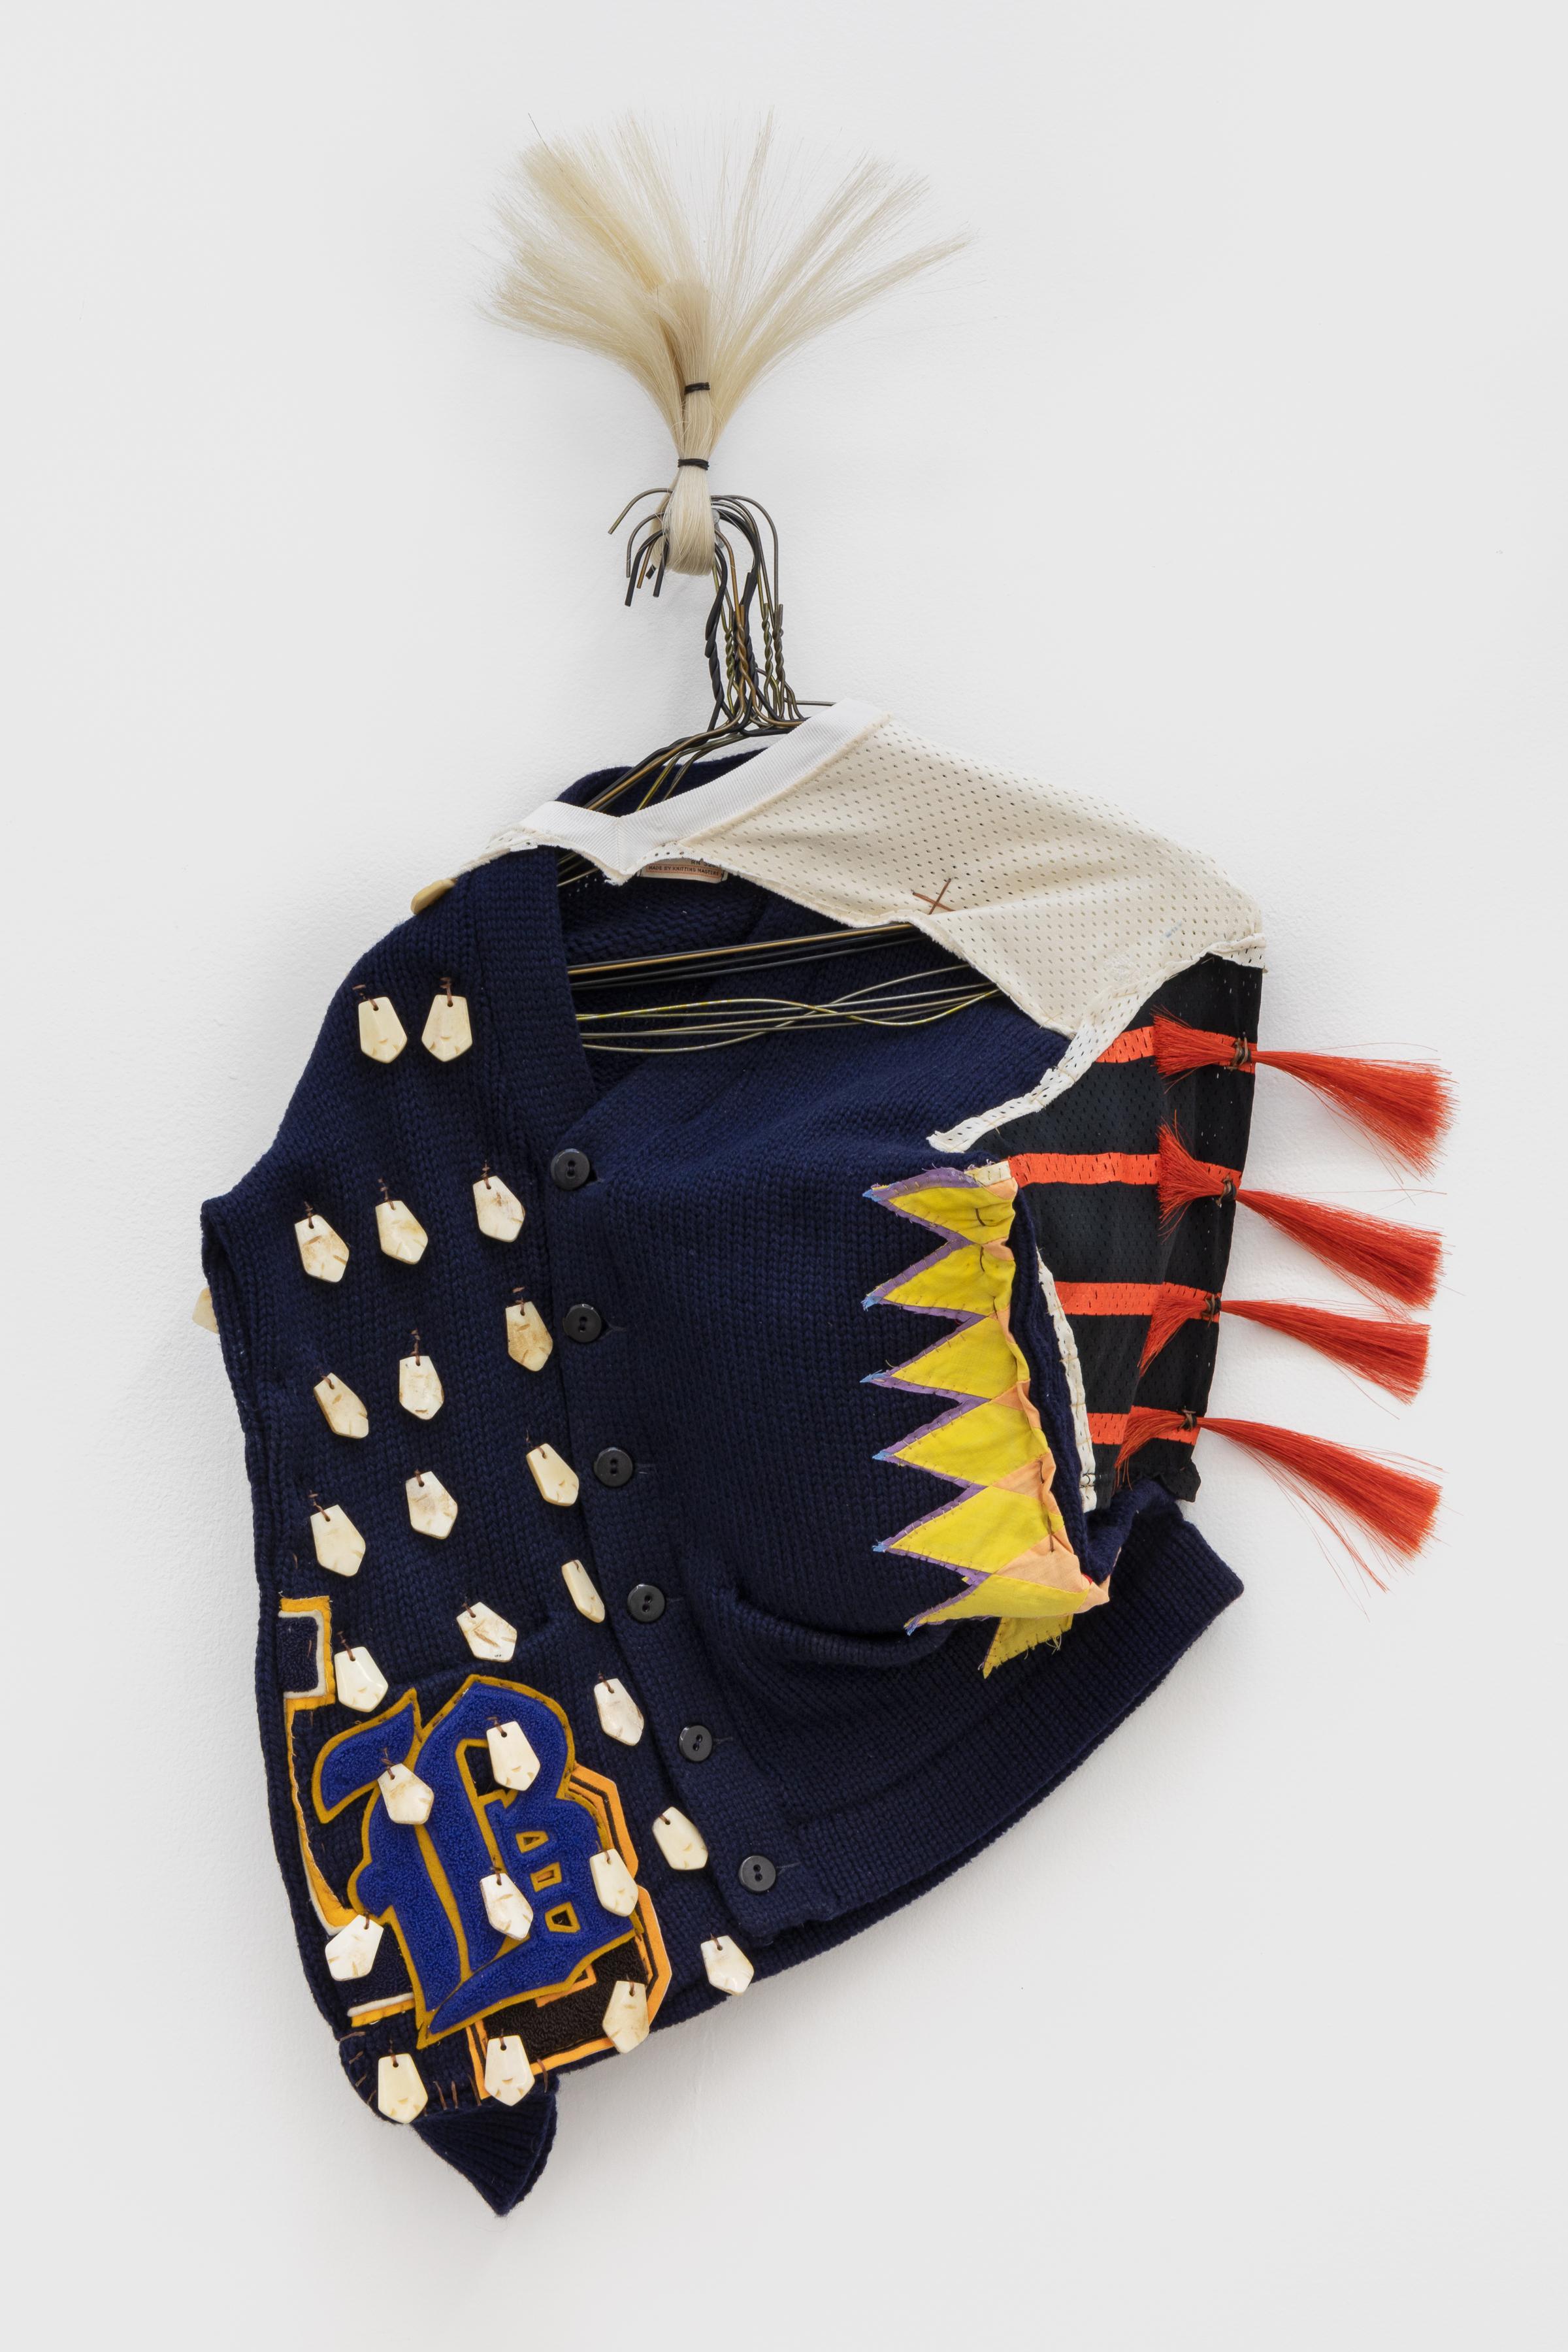 NATALIE BALL<br /><i>Breast Plate (series)</i>, 2019<br />bone, textiles, horsehair, metal, chenille, 84 x 64 x 13 cm<br />